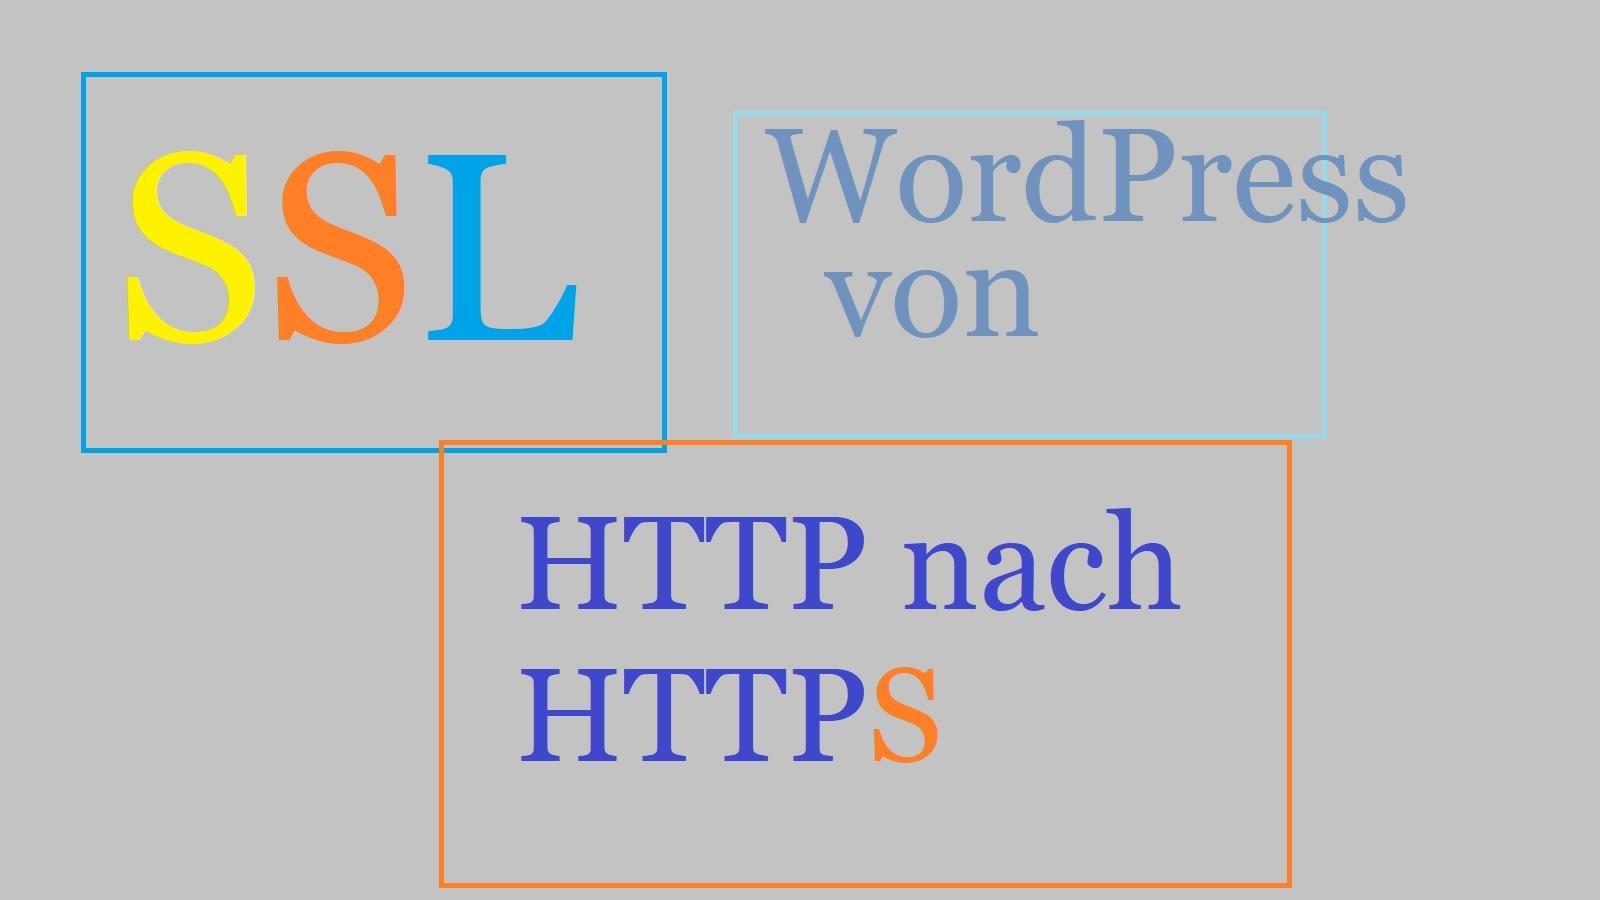 wordpress-http-nach-https